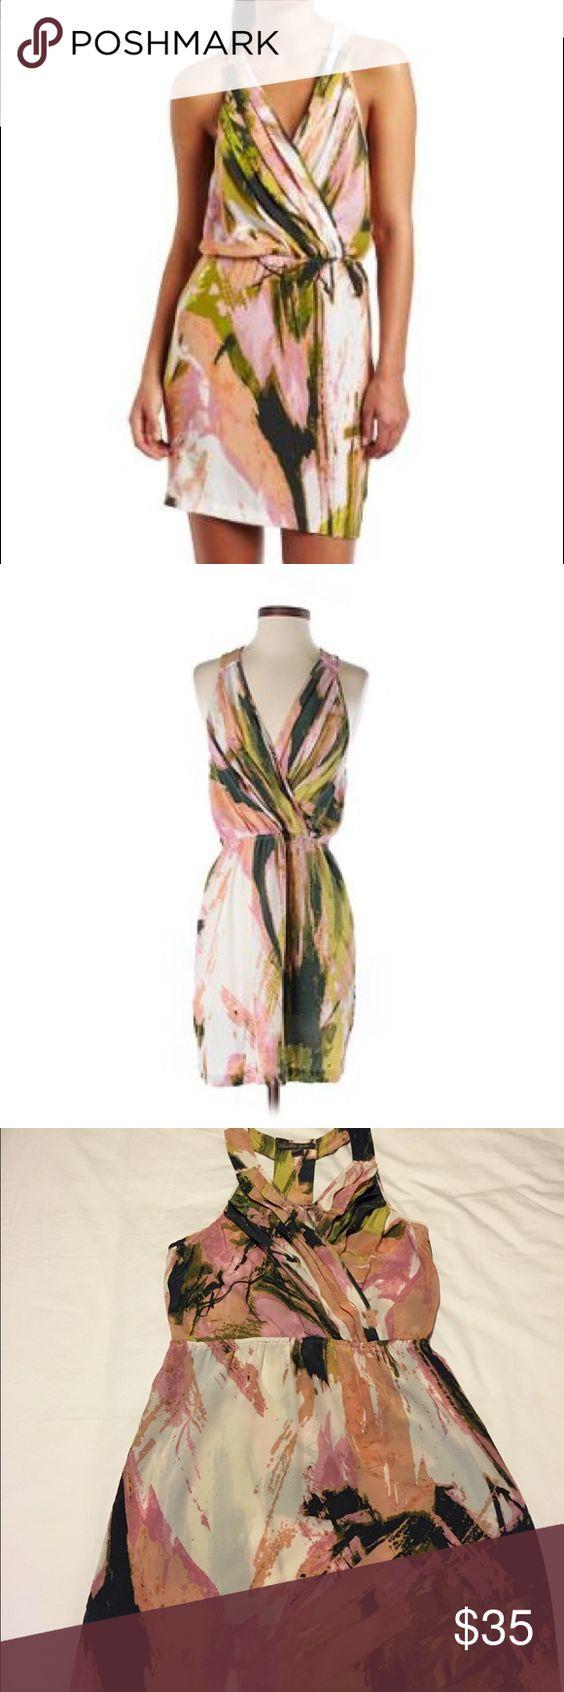 100% pink and green silk dress Charlie Jade Women's Tracie dress. 100% silk. Racerback Charlie Jade Dresses